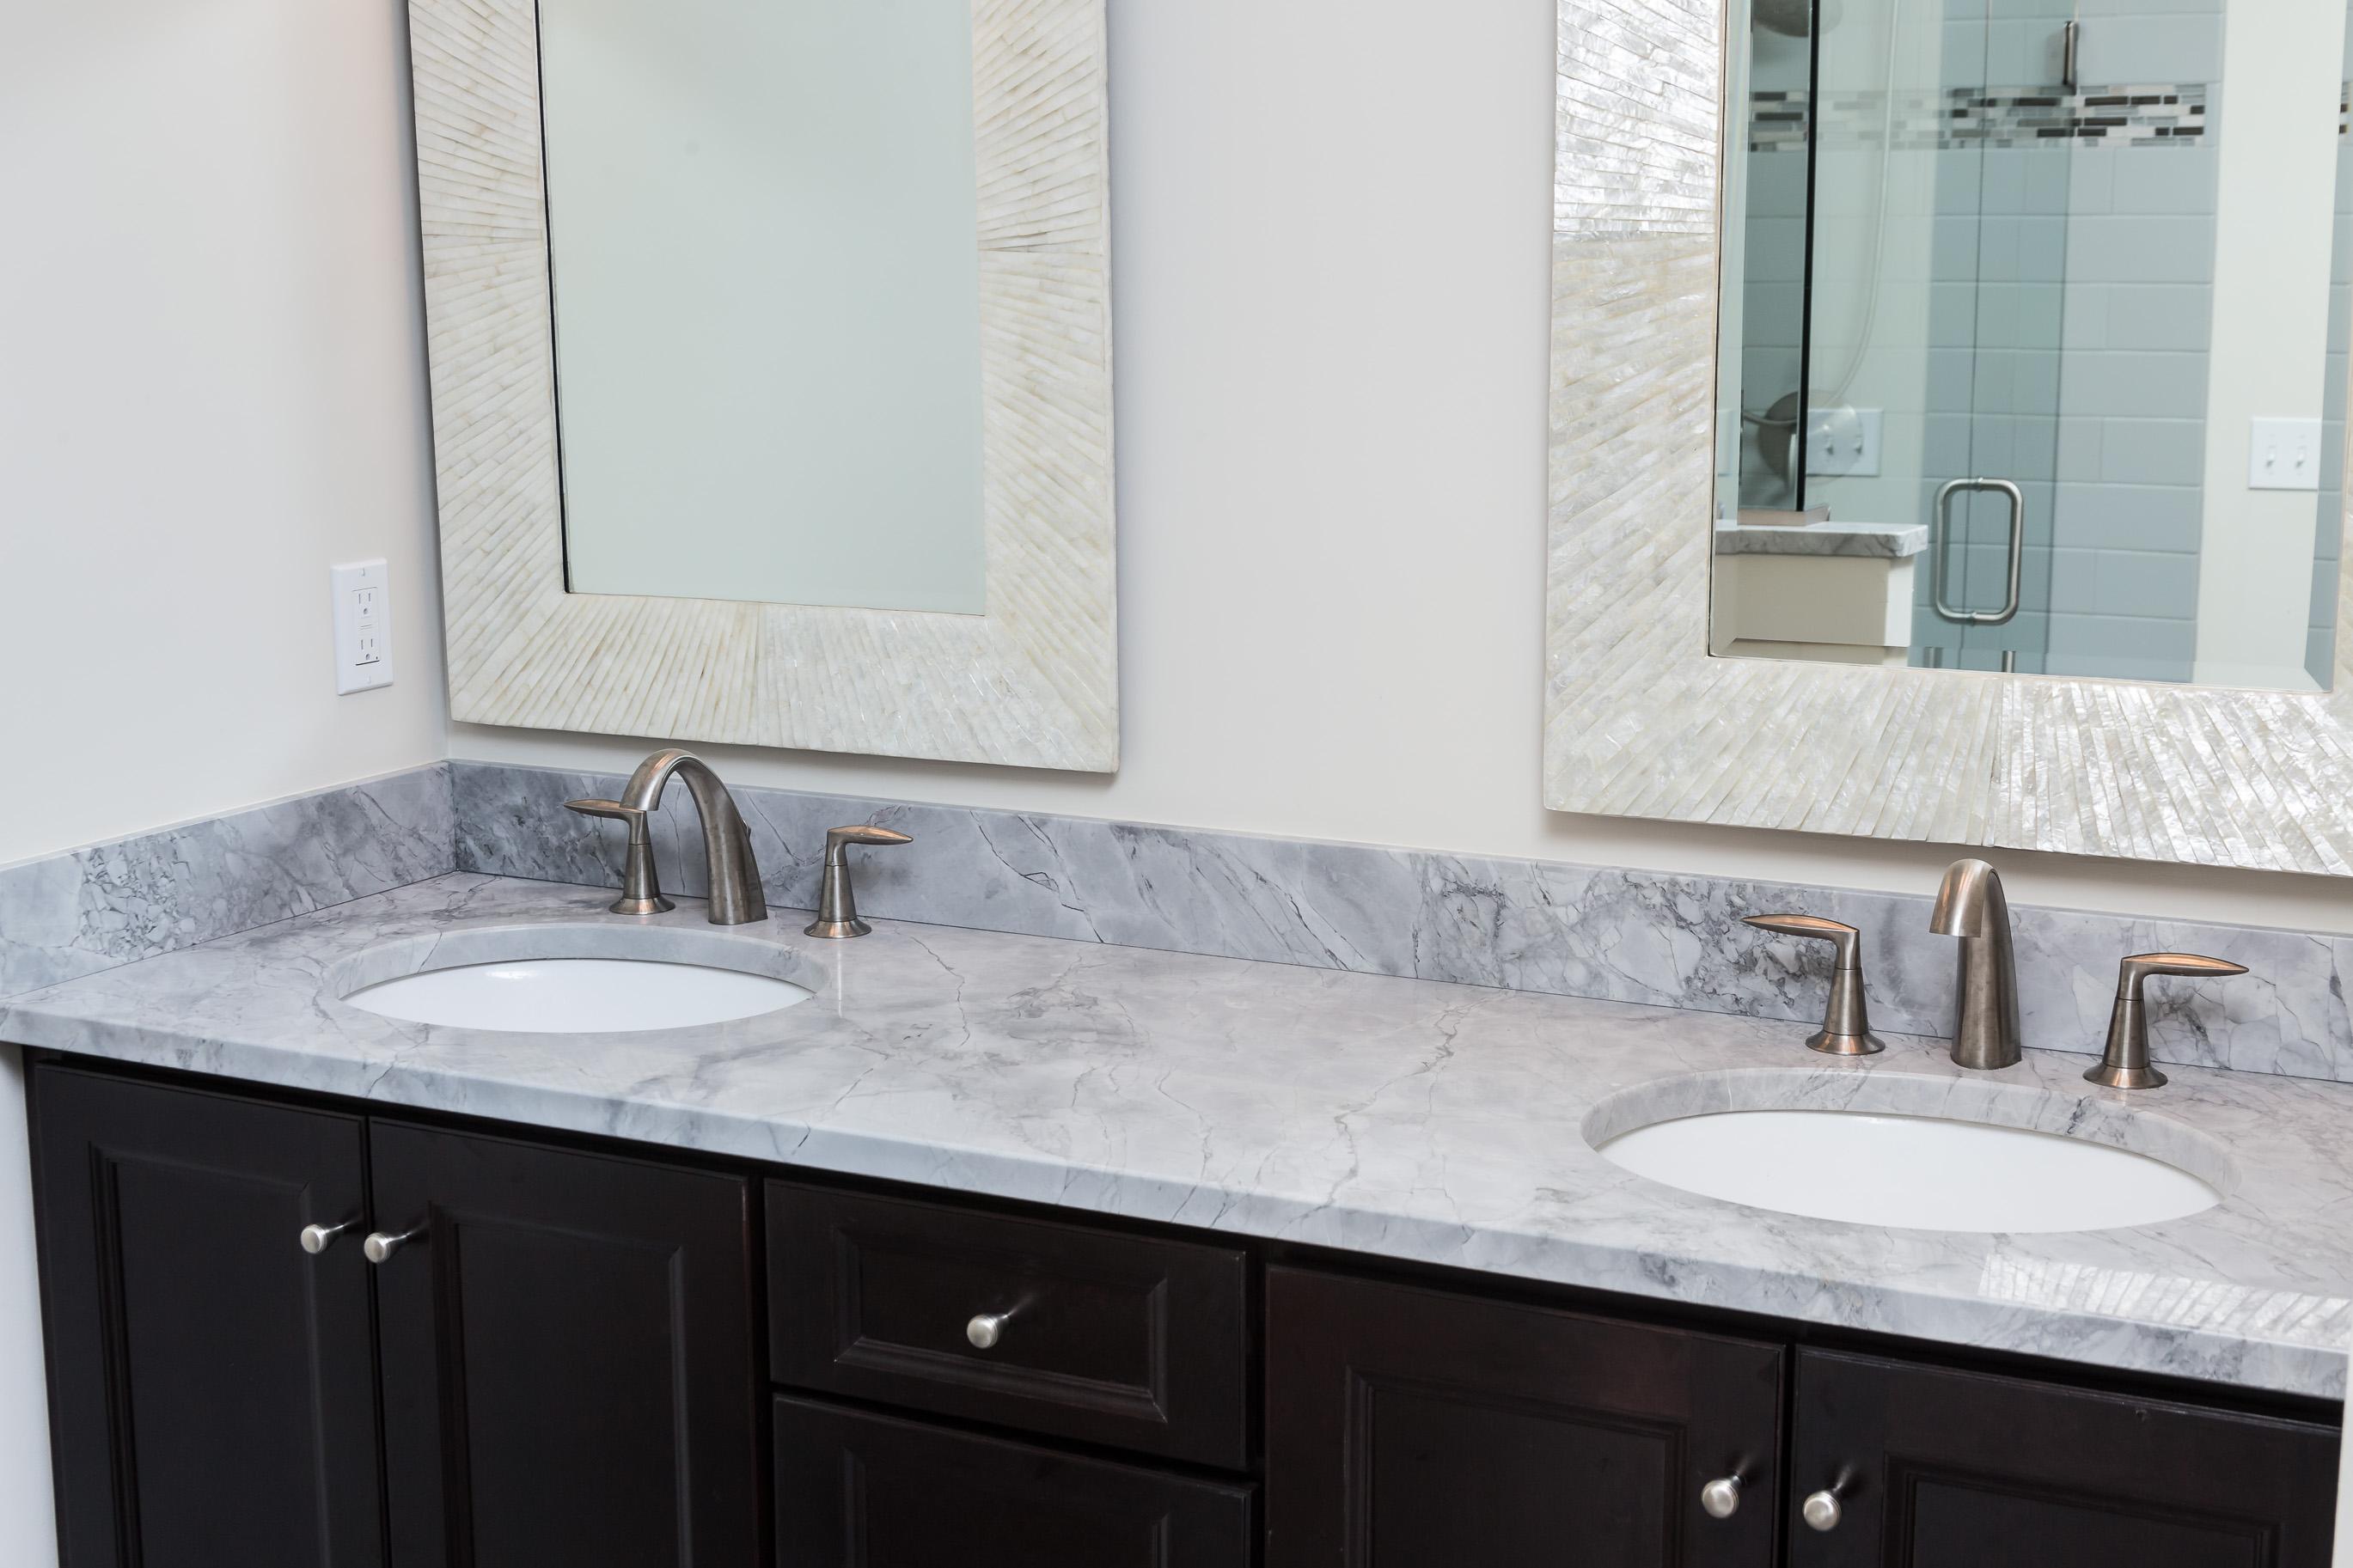 Northern Granite Super White Extra Quartzite Vanity